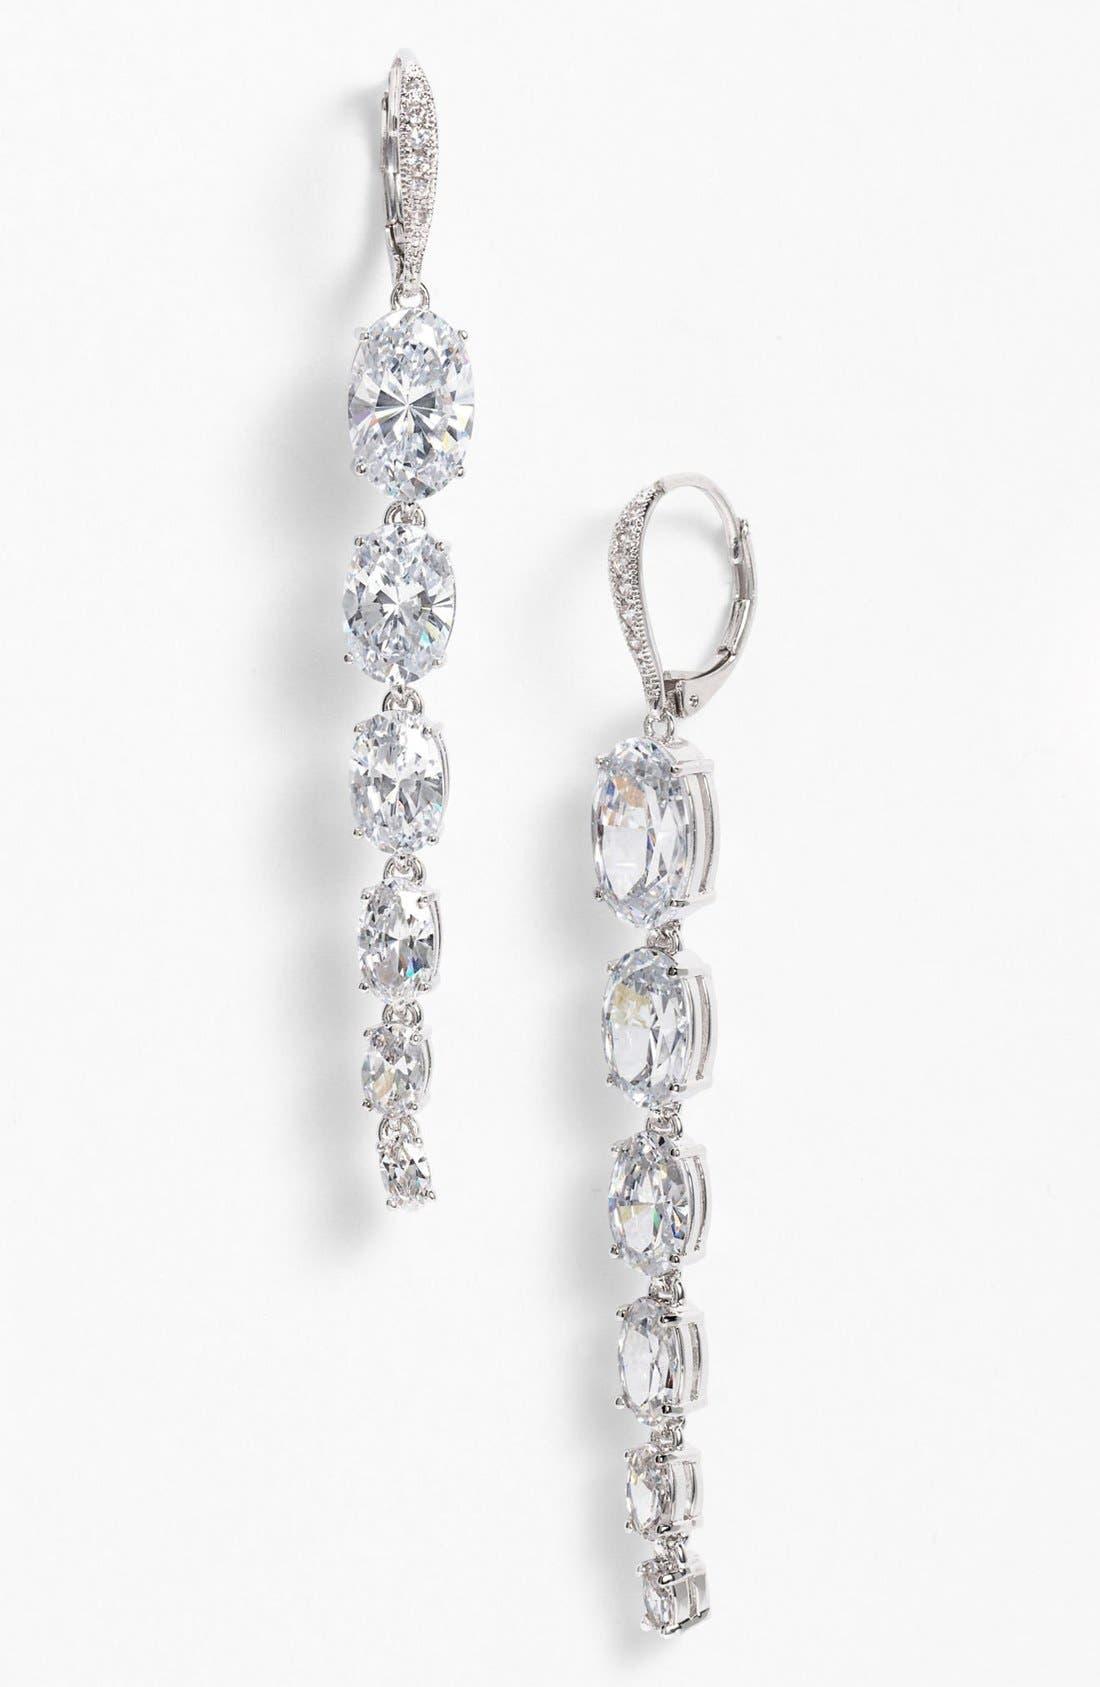 Main Image - Nadri Cubic Zirconia Linear Earrings (Nordstrom Exclusive)